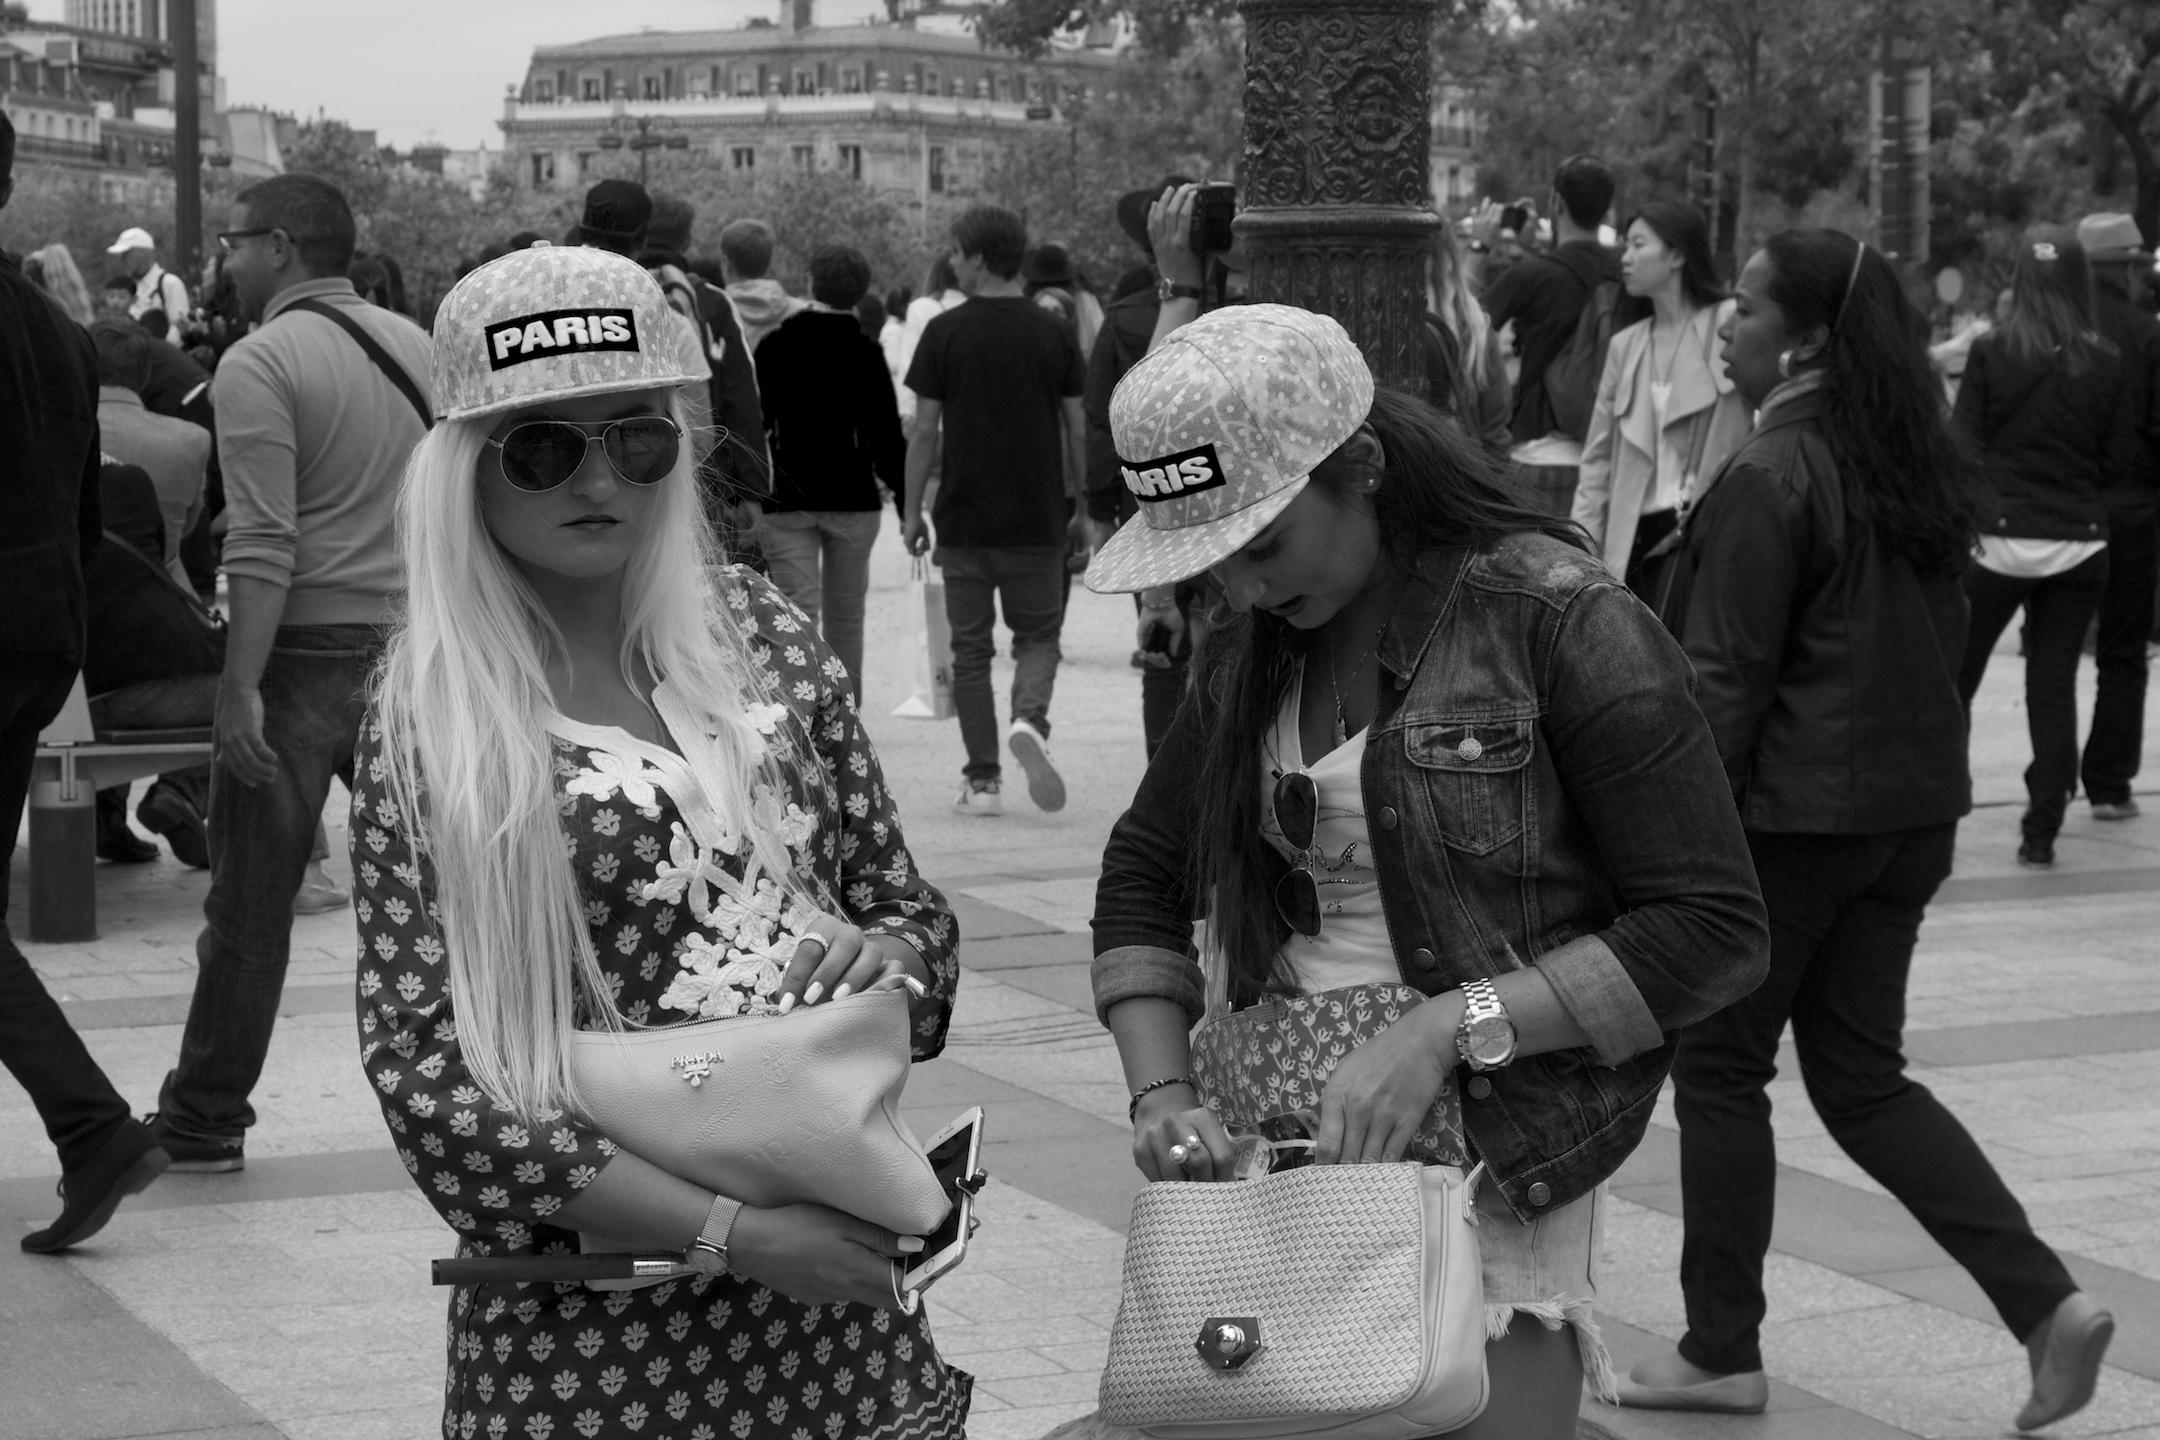 Paris, digital